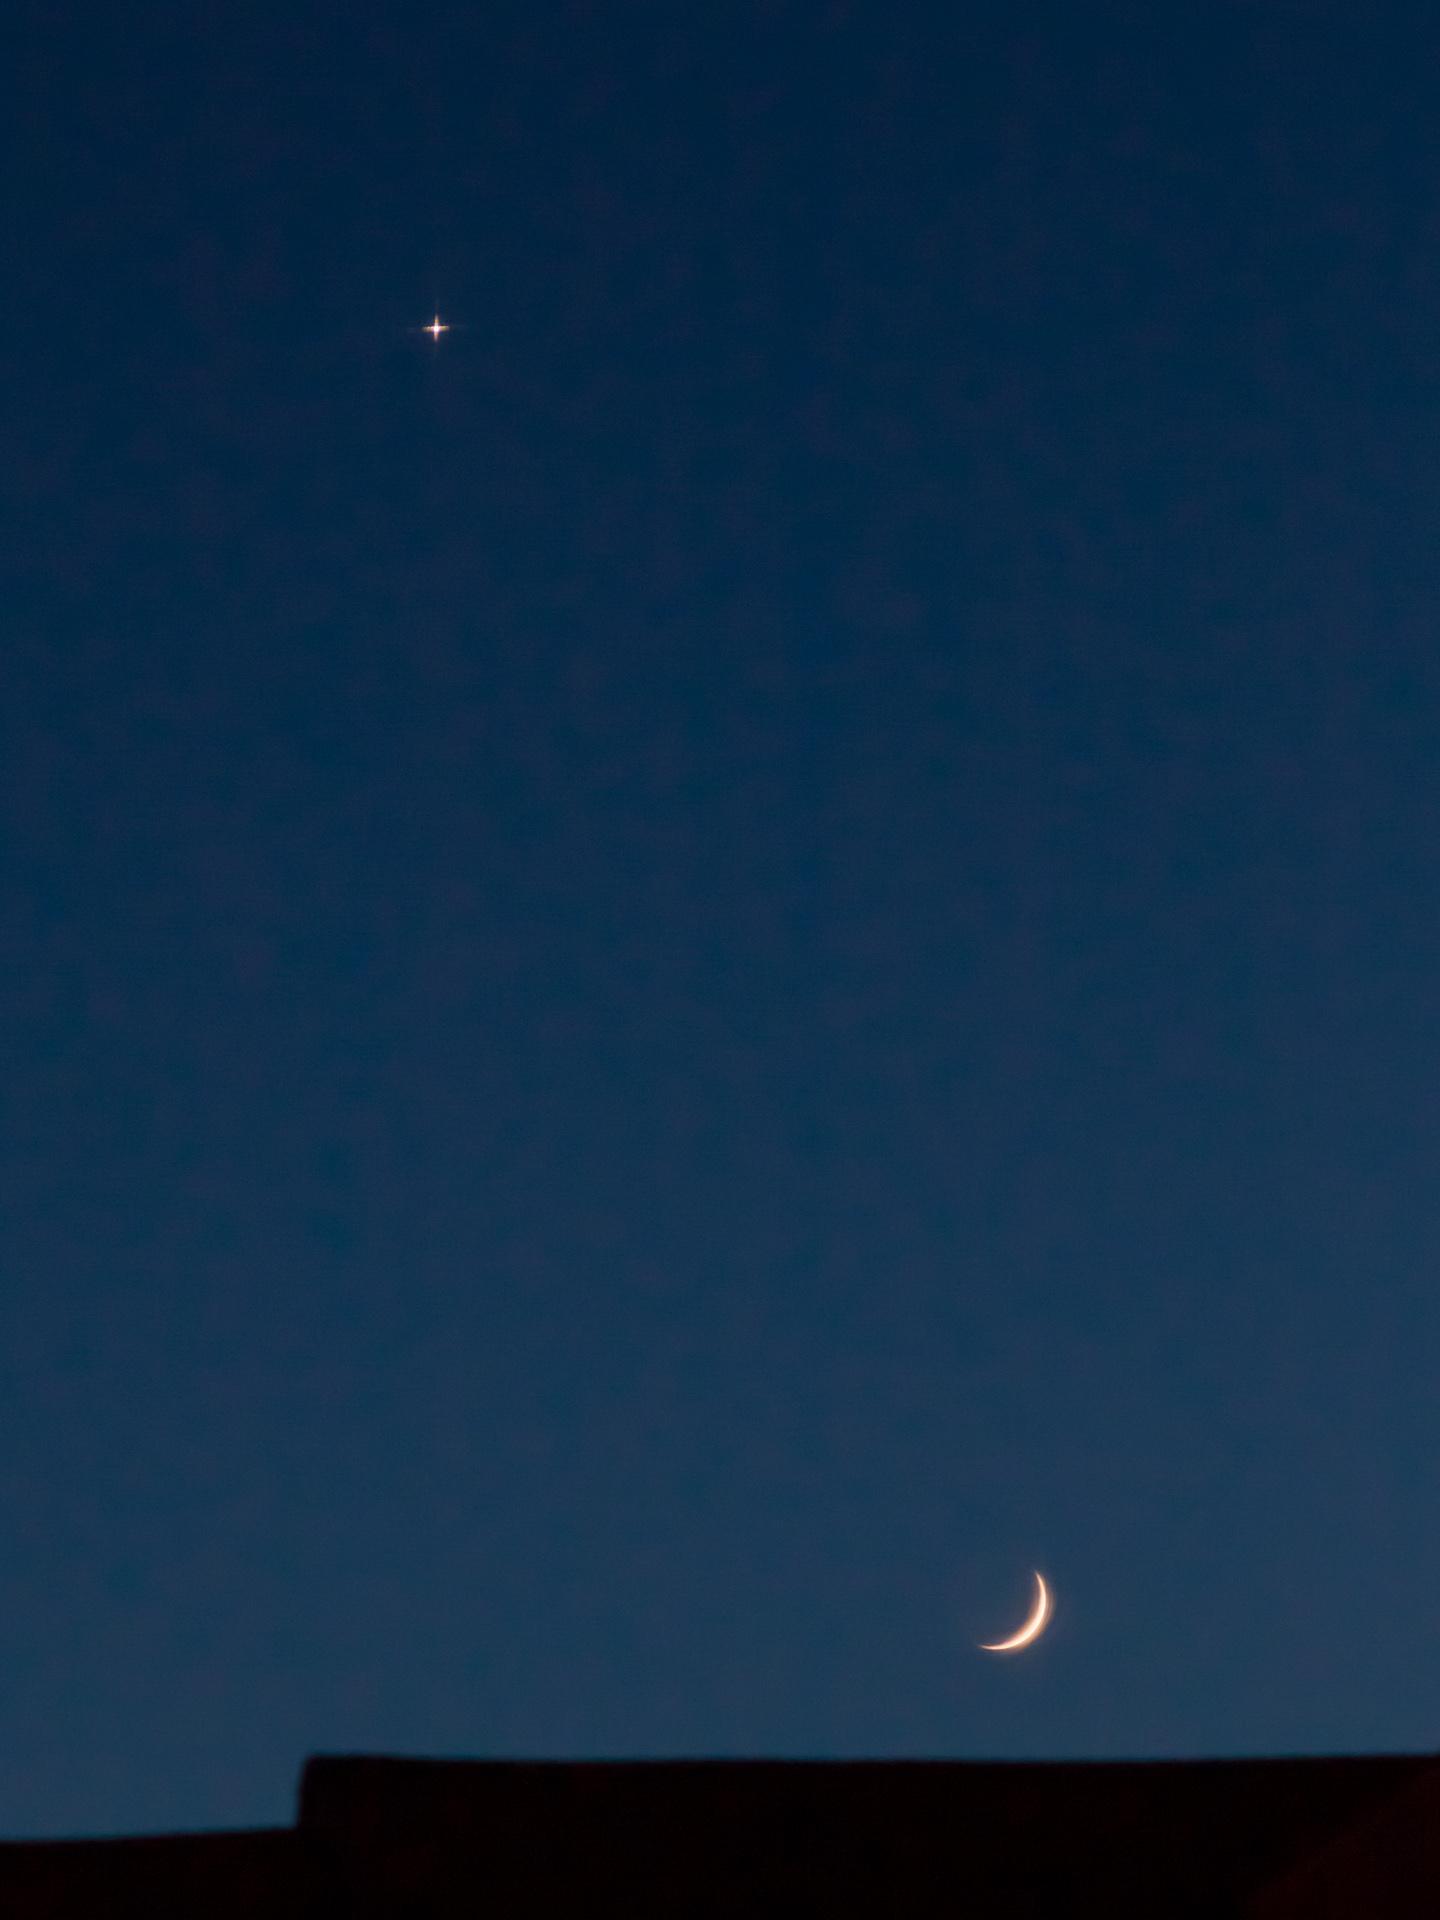 Venus Watching the Moonset | 20180615 2053 W:38.96x77.00@84m